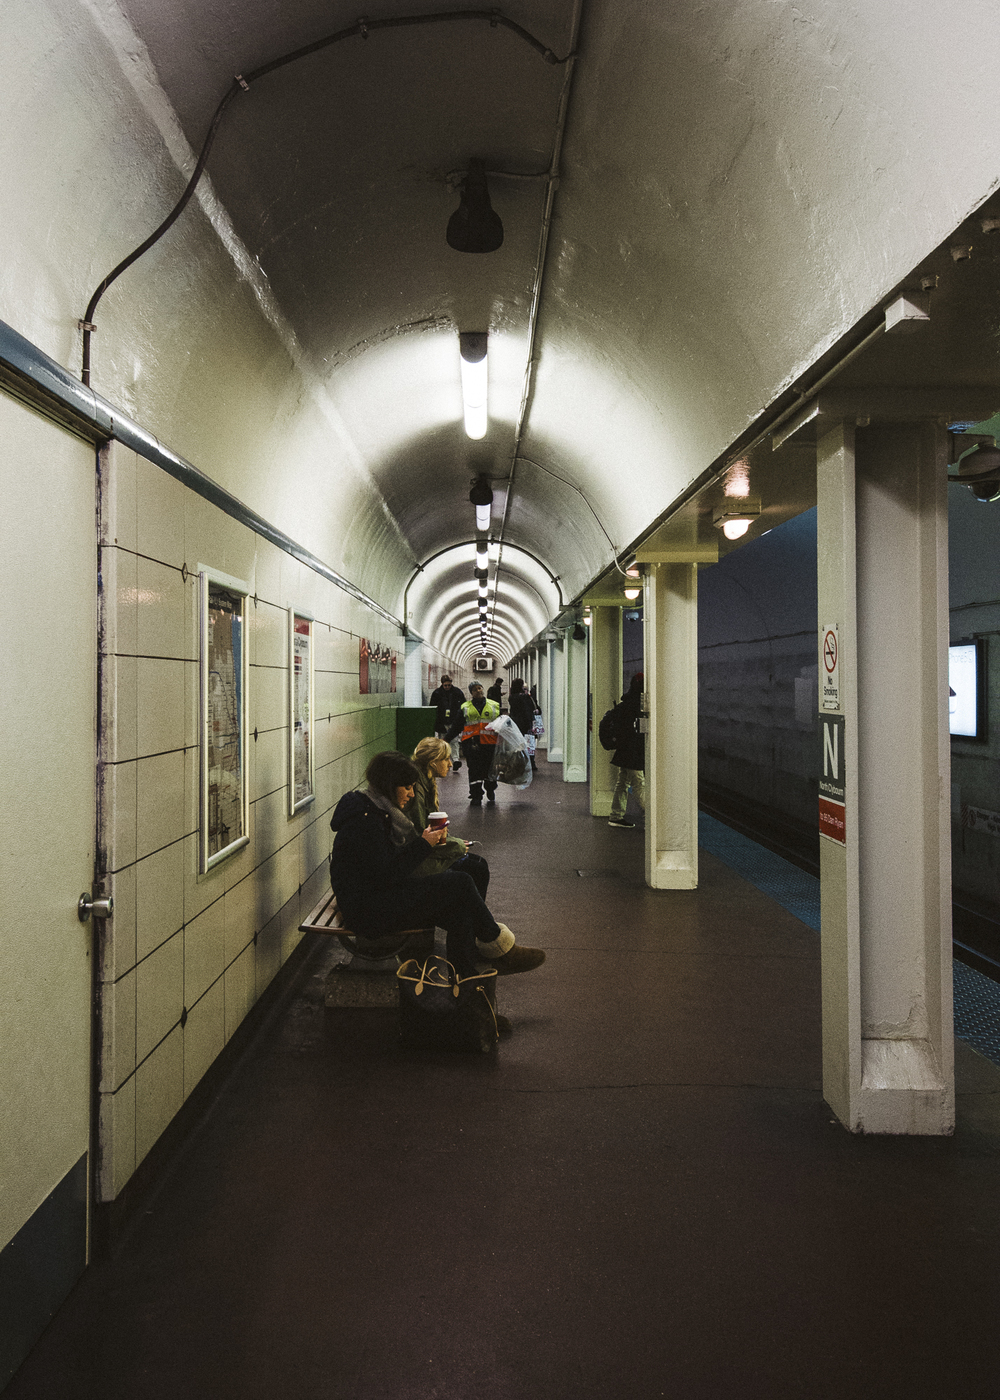 North/Clybourn Station Platform, Lincoln Park, Chicago;November 2013